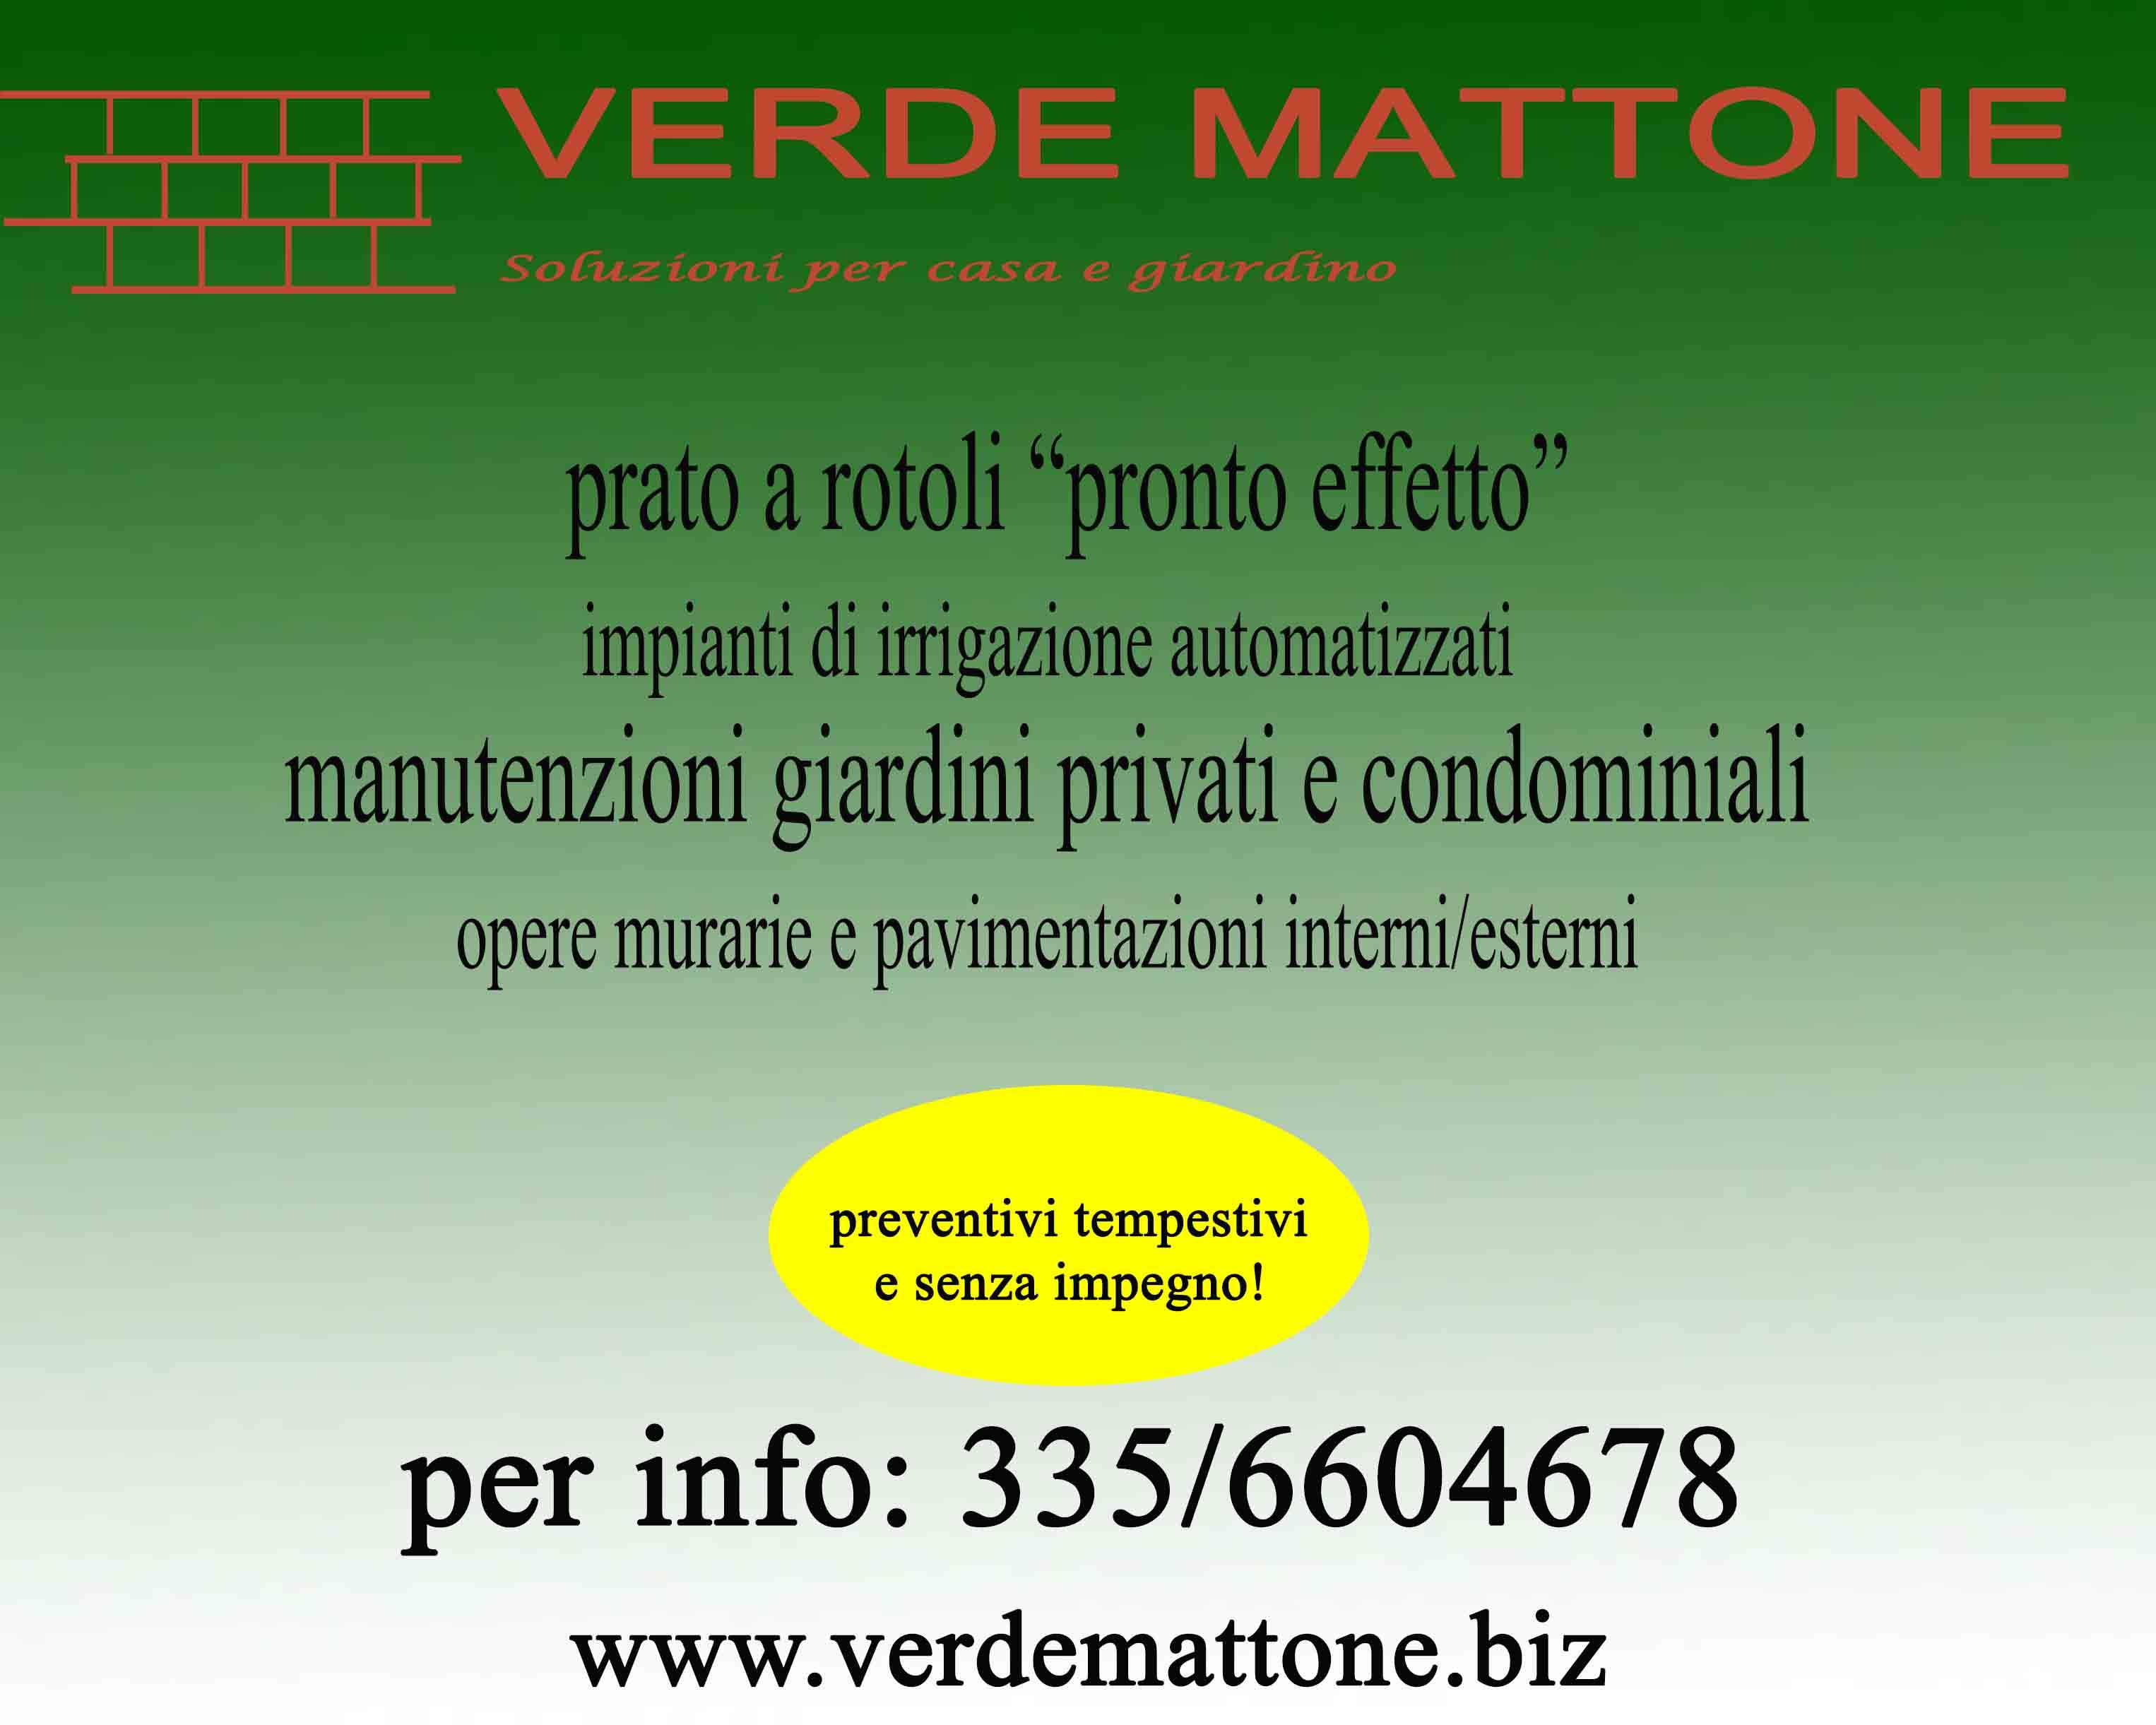 Verde Mattone